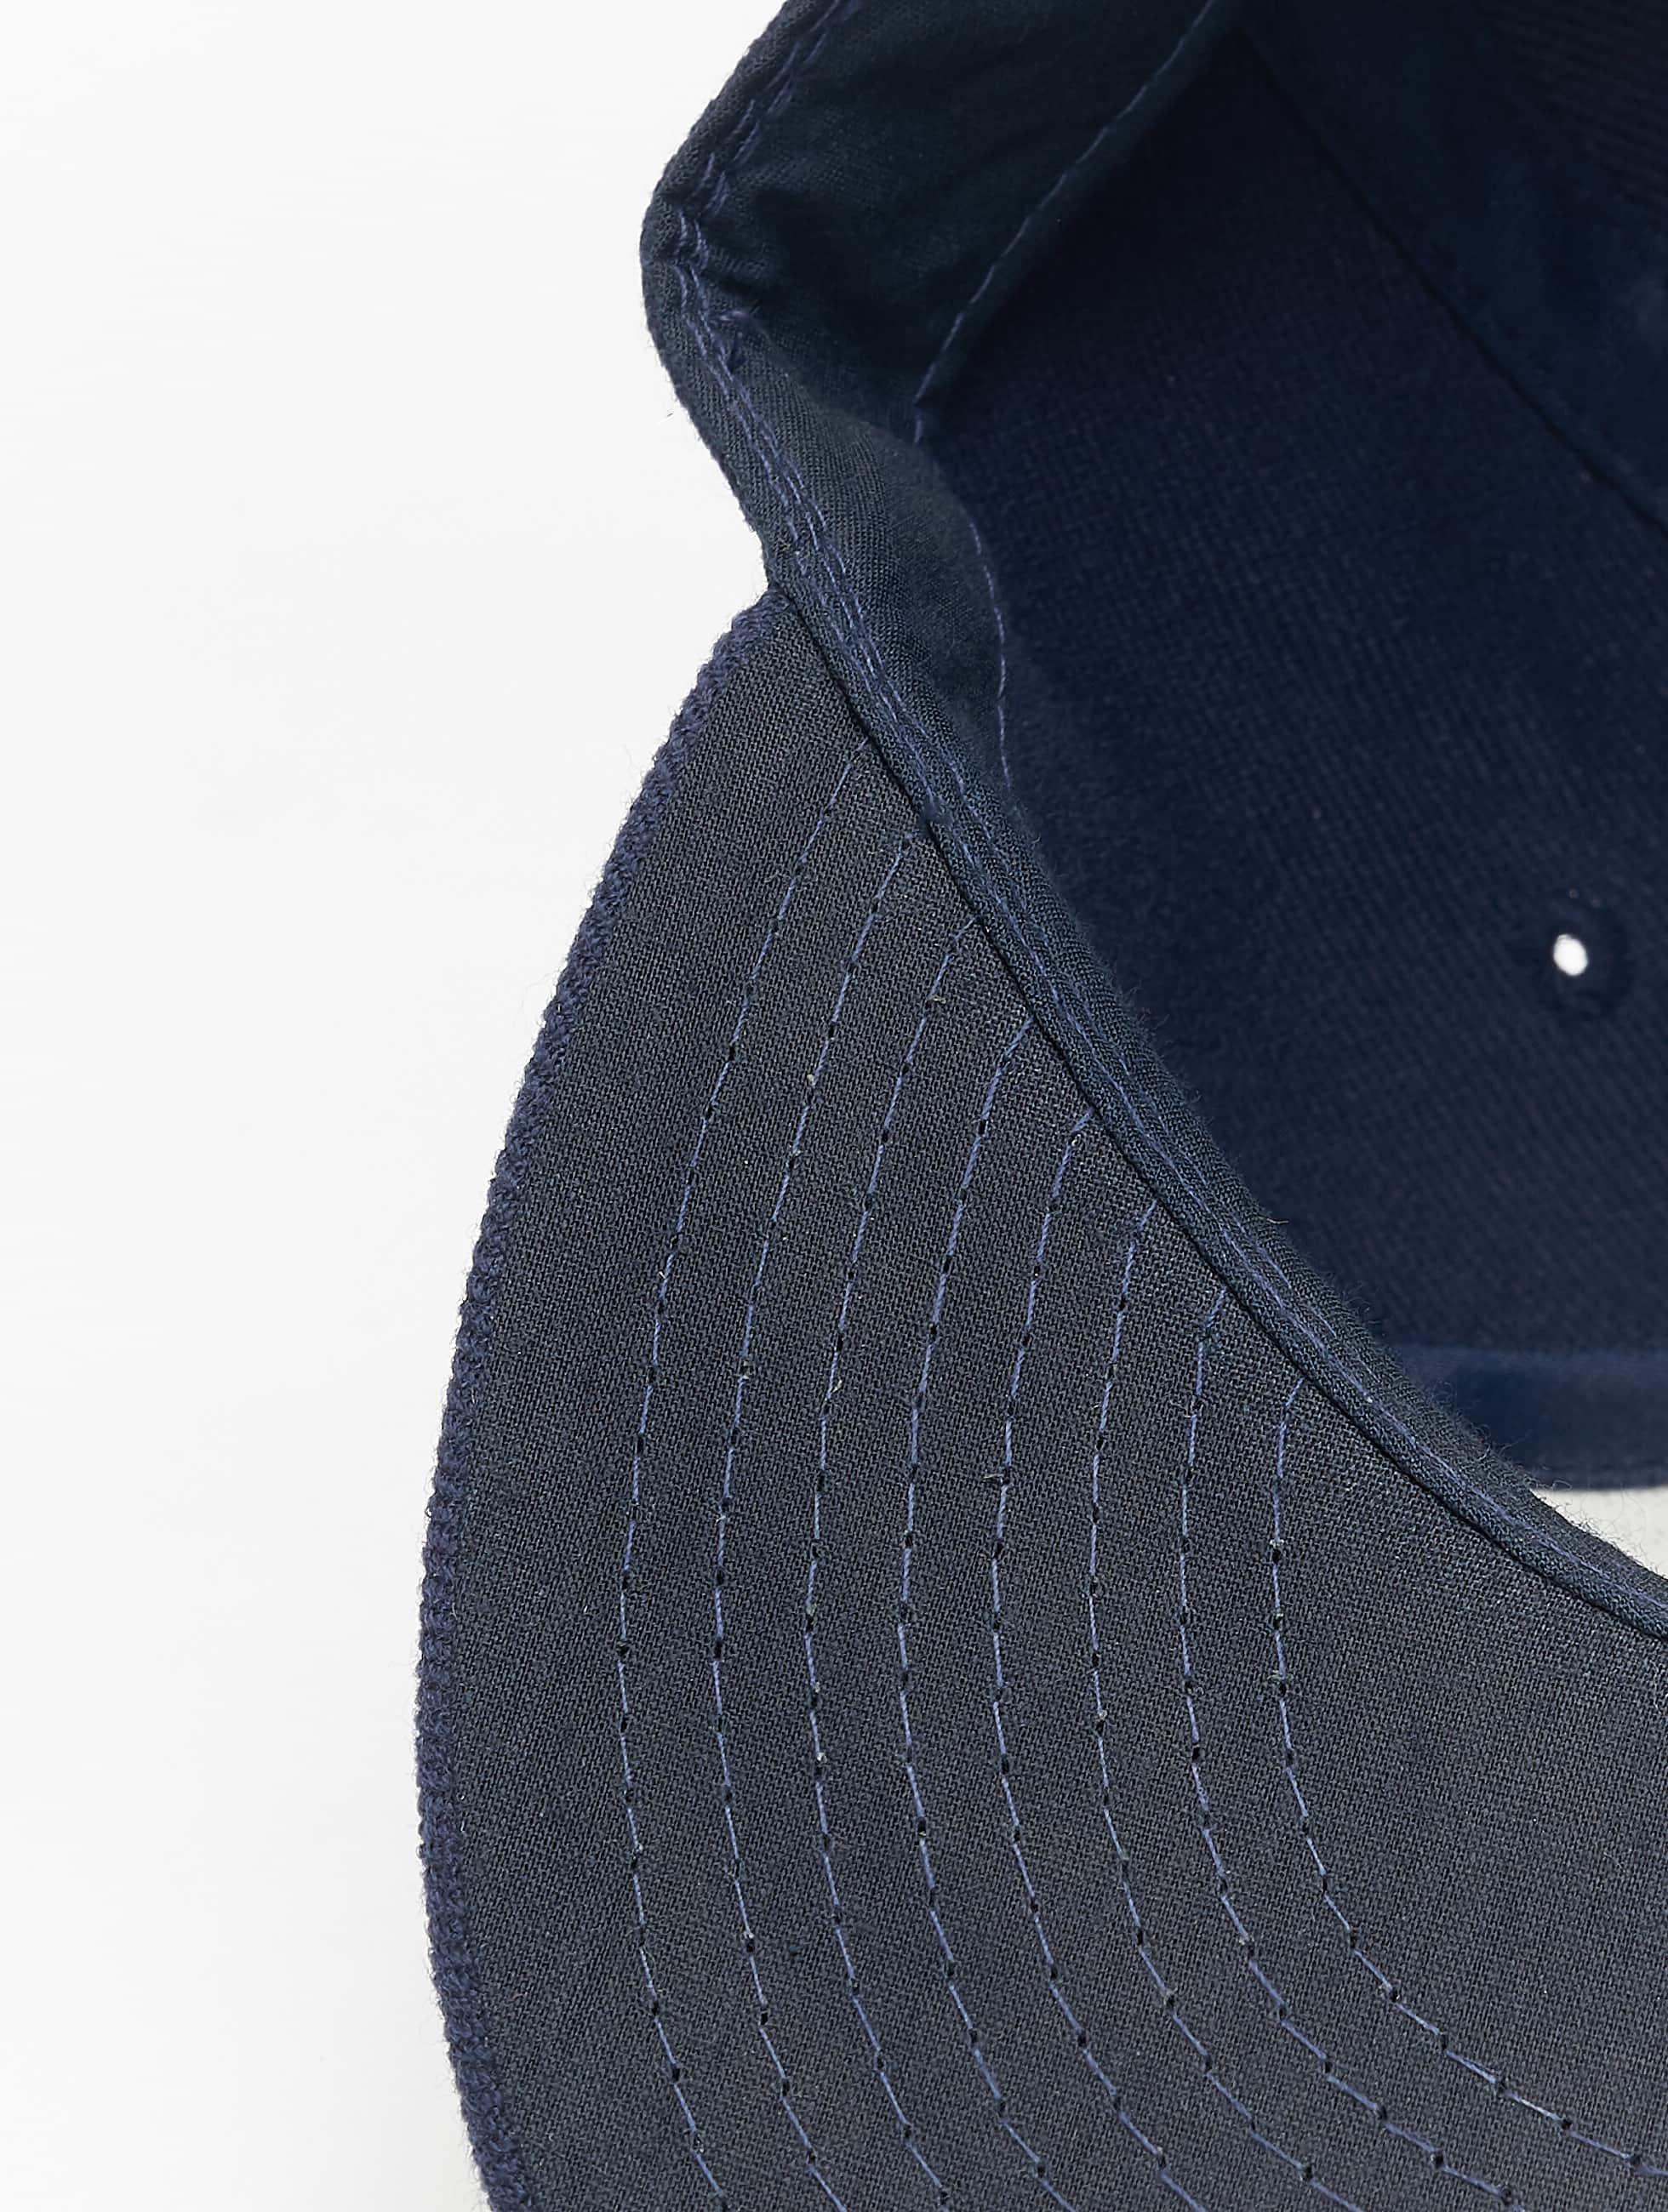 Decky USA Fitted Cap Flat Bill blauw